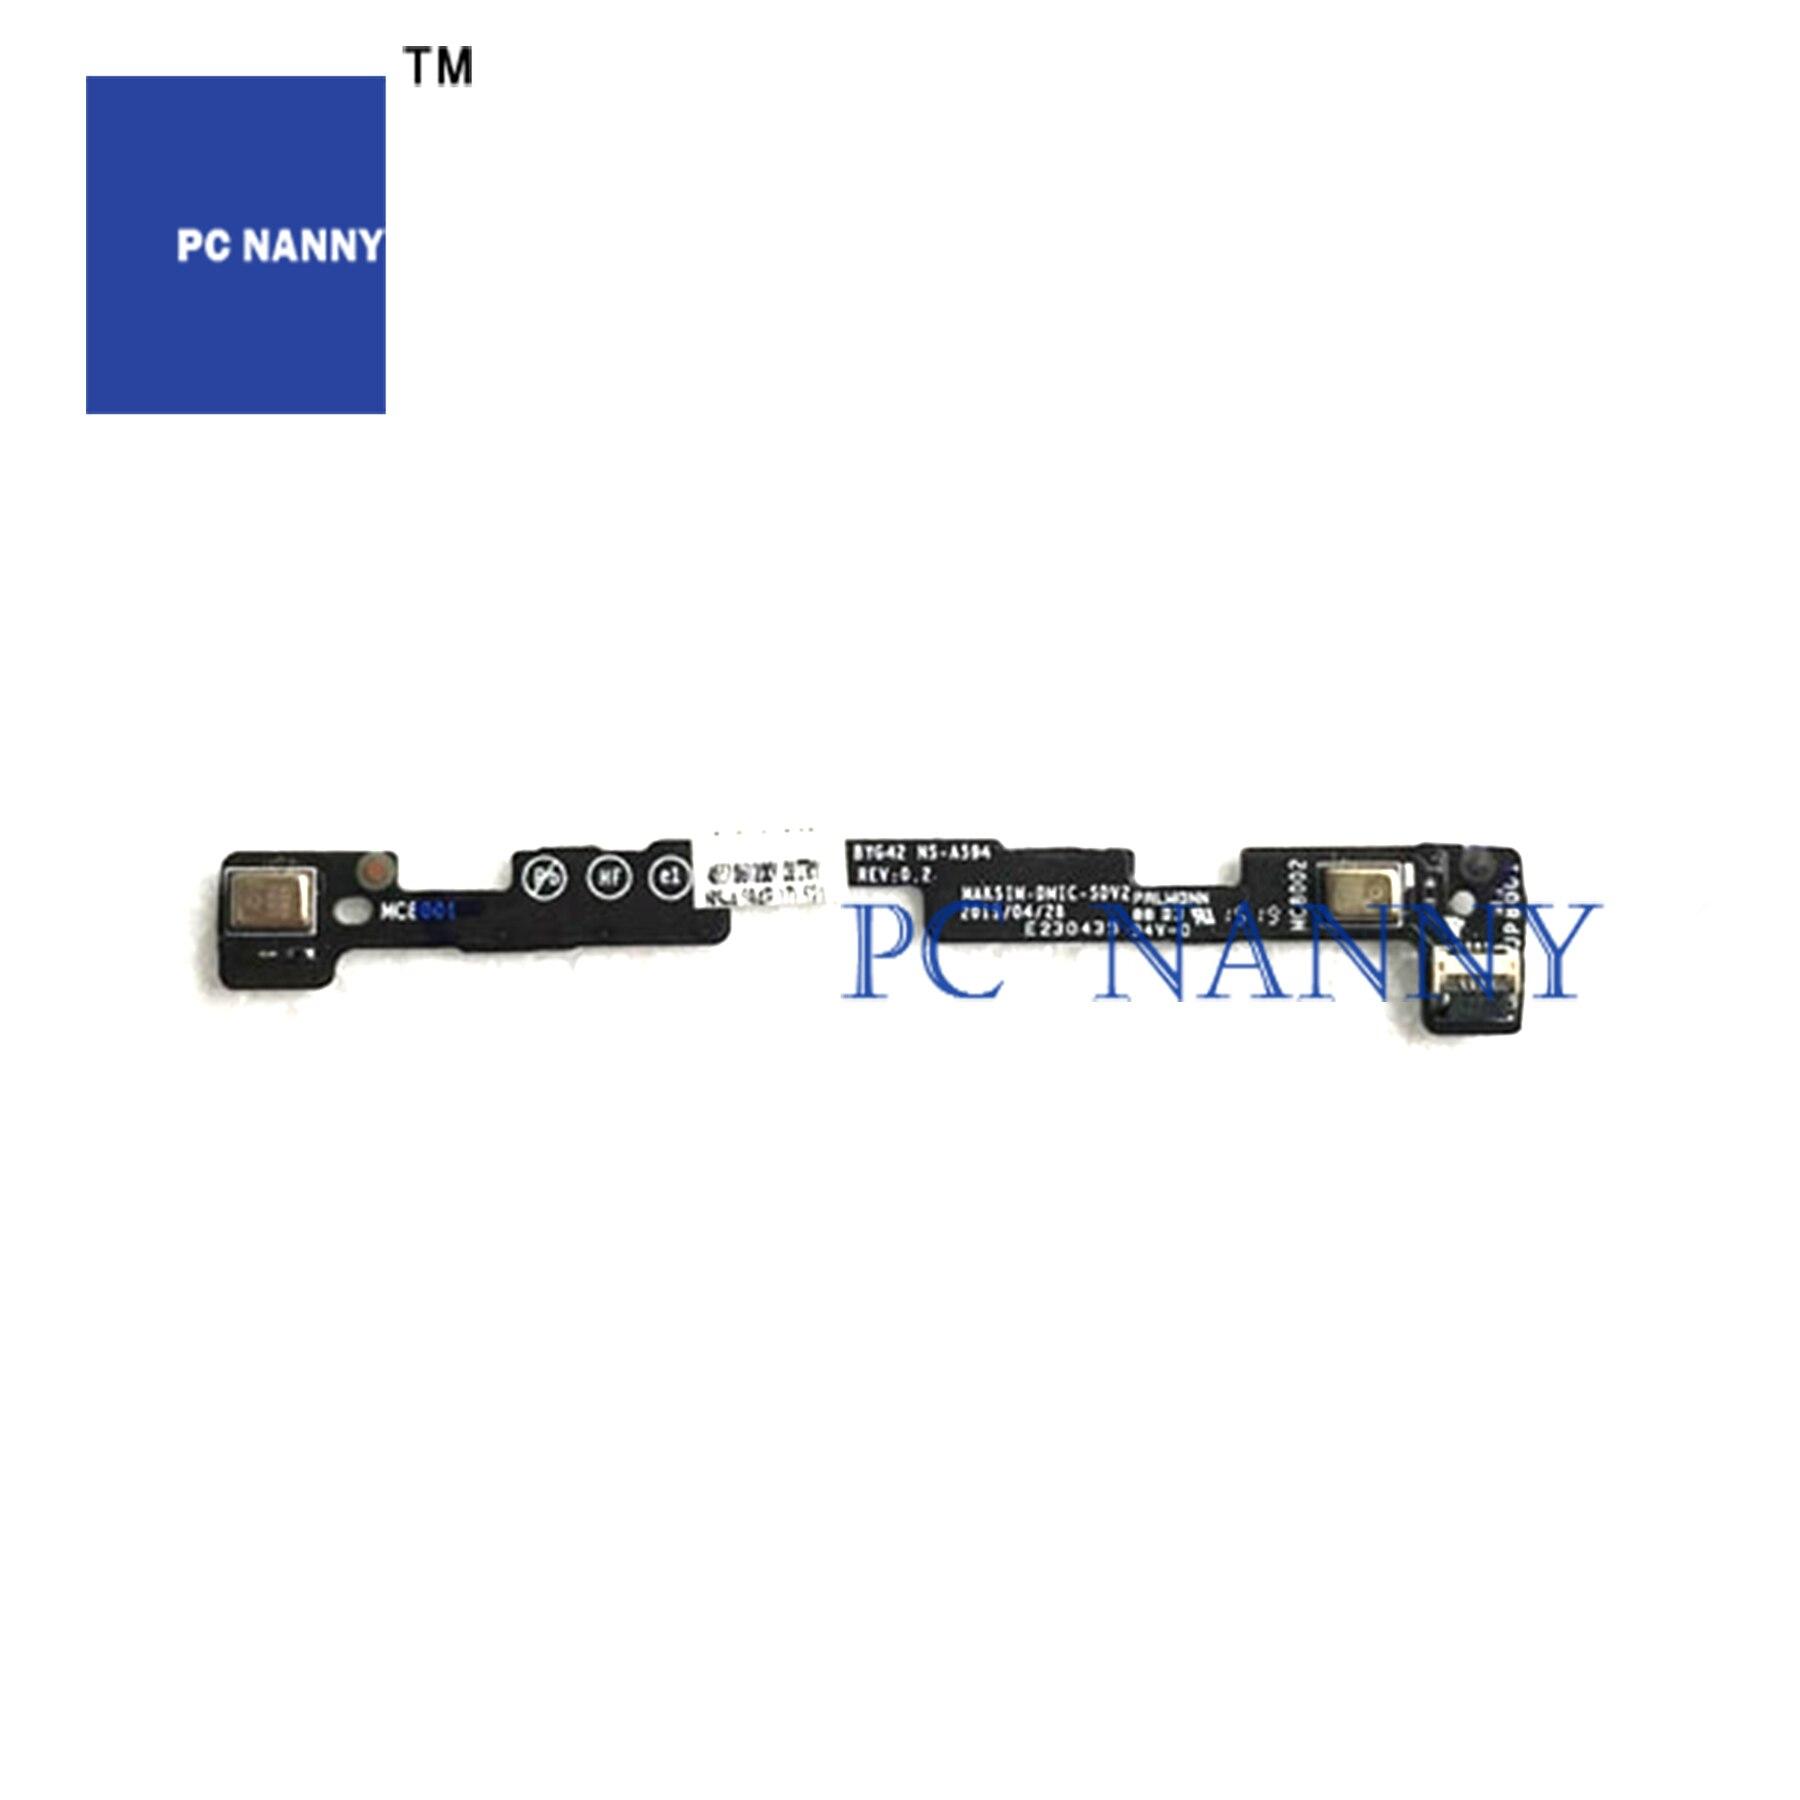 Pcnورخيصة لليوجا 900s-12ISK الداخلية ميكروفون usb مجلس NS-A595 لوحة اللمس NS-A594 5C50K93795 مجلس الطاقة NS-A592P